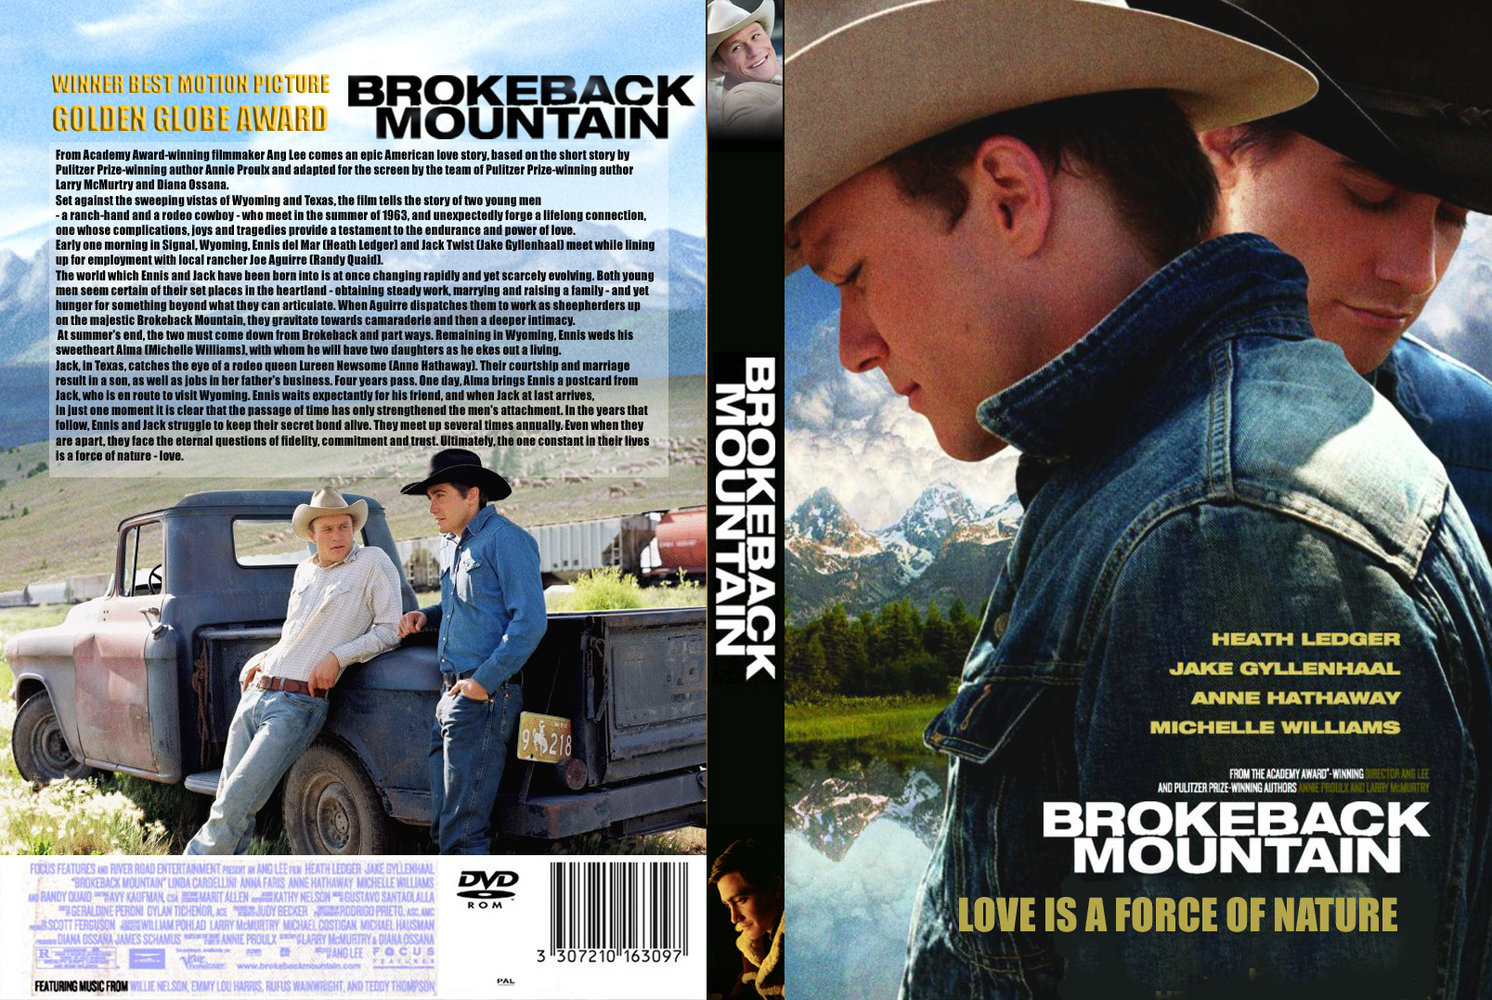 Covers Box Sk Brokeback Mountain 2005 High Quality Dvd Blueray Movie